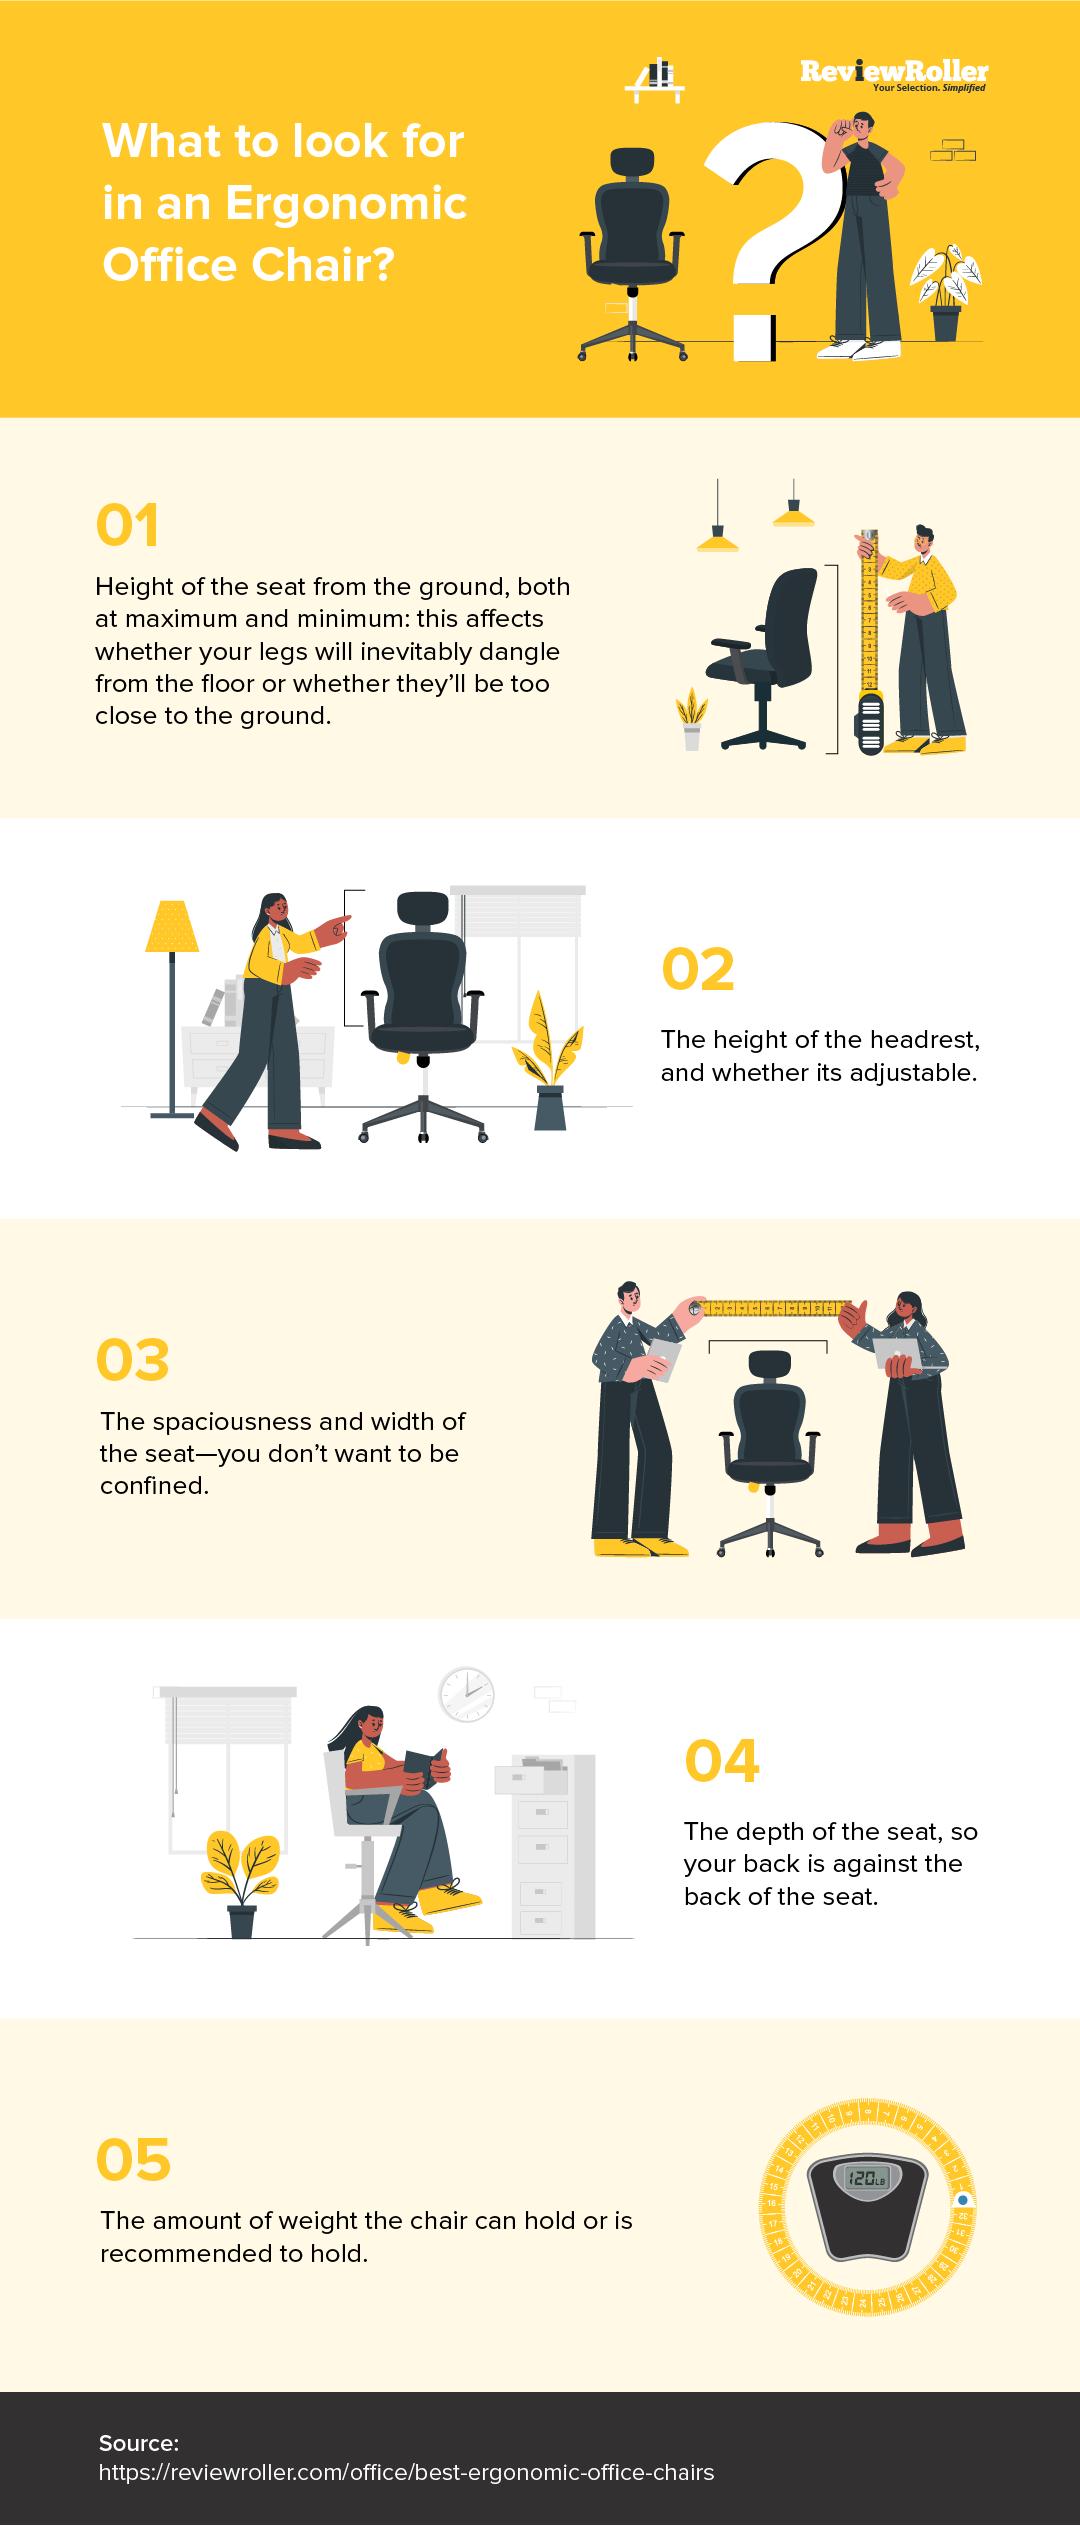 Best Ergonomic Office Chairs (infographic)